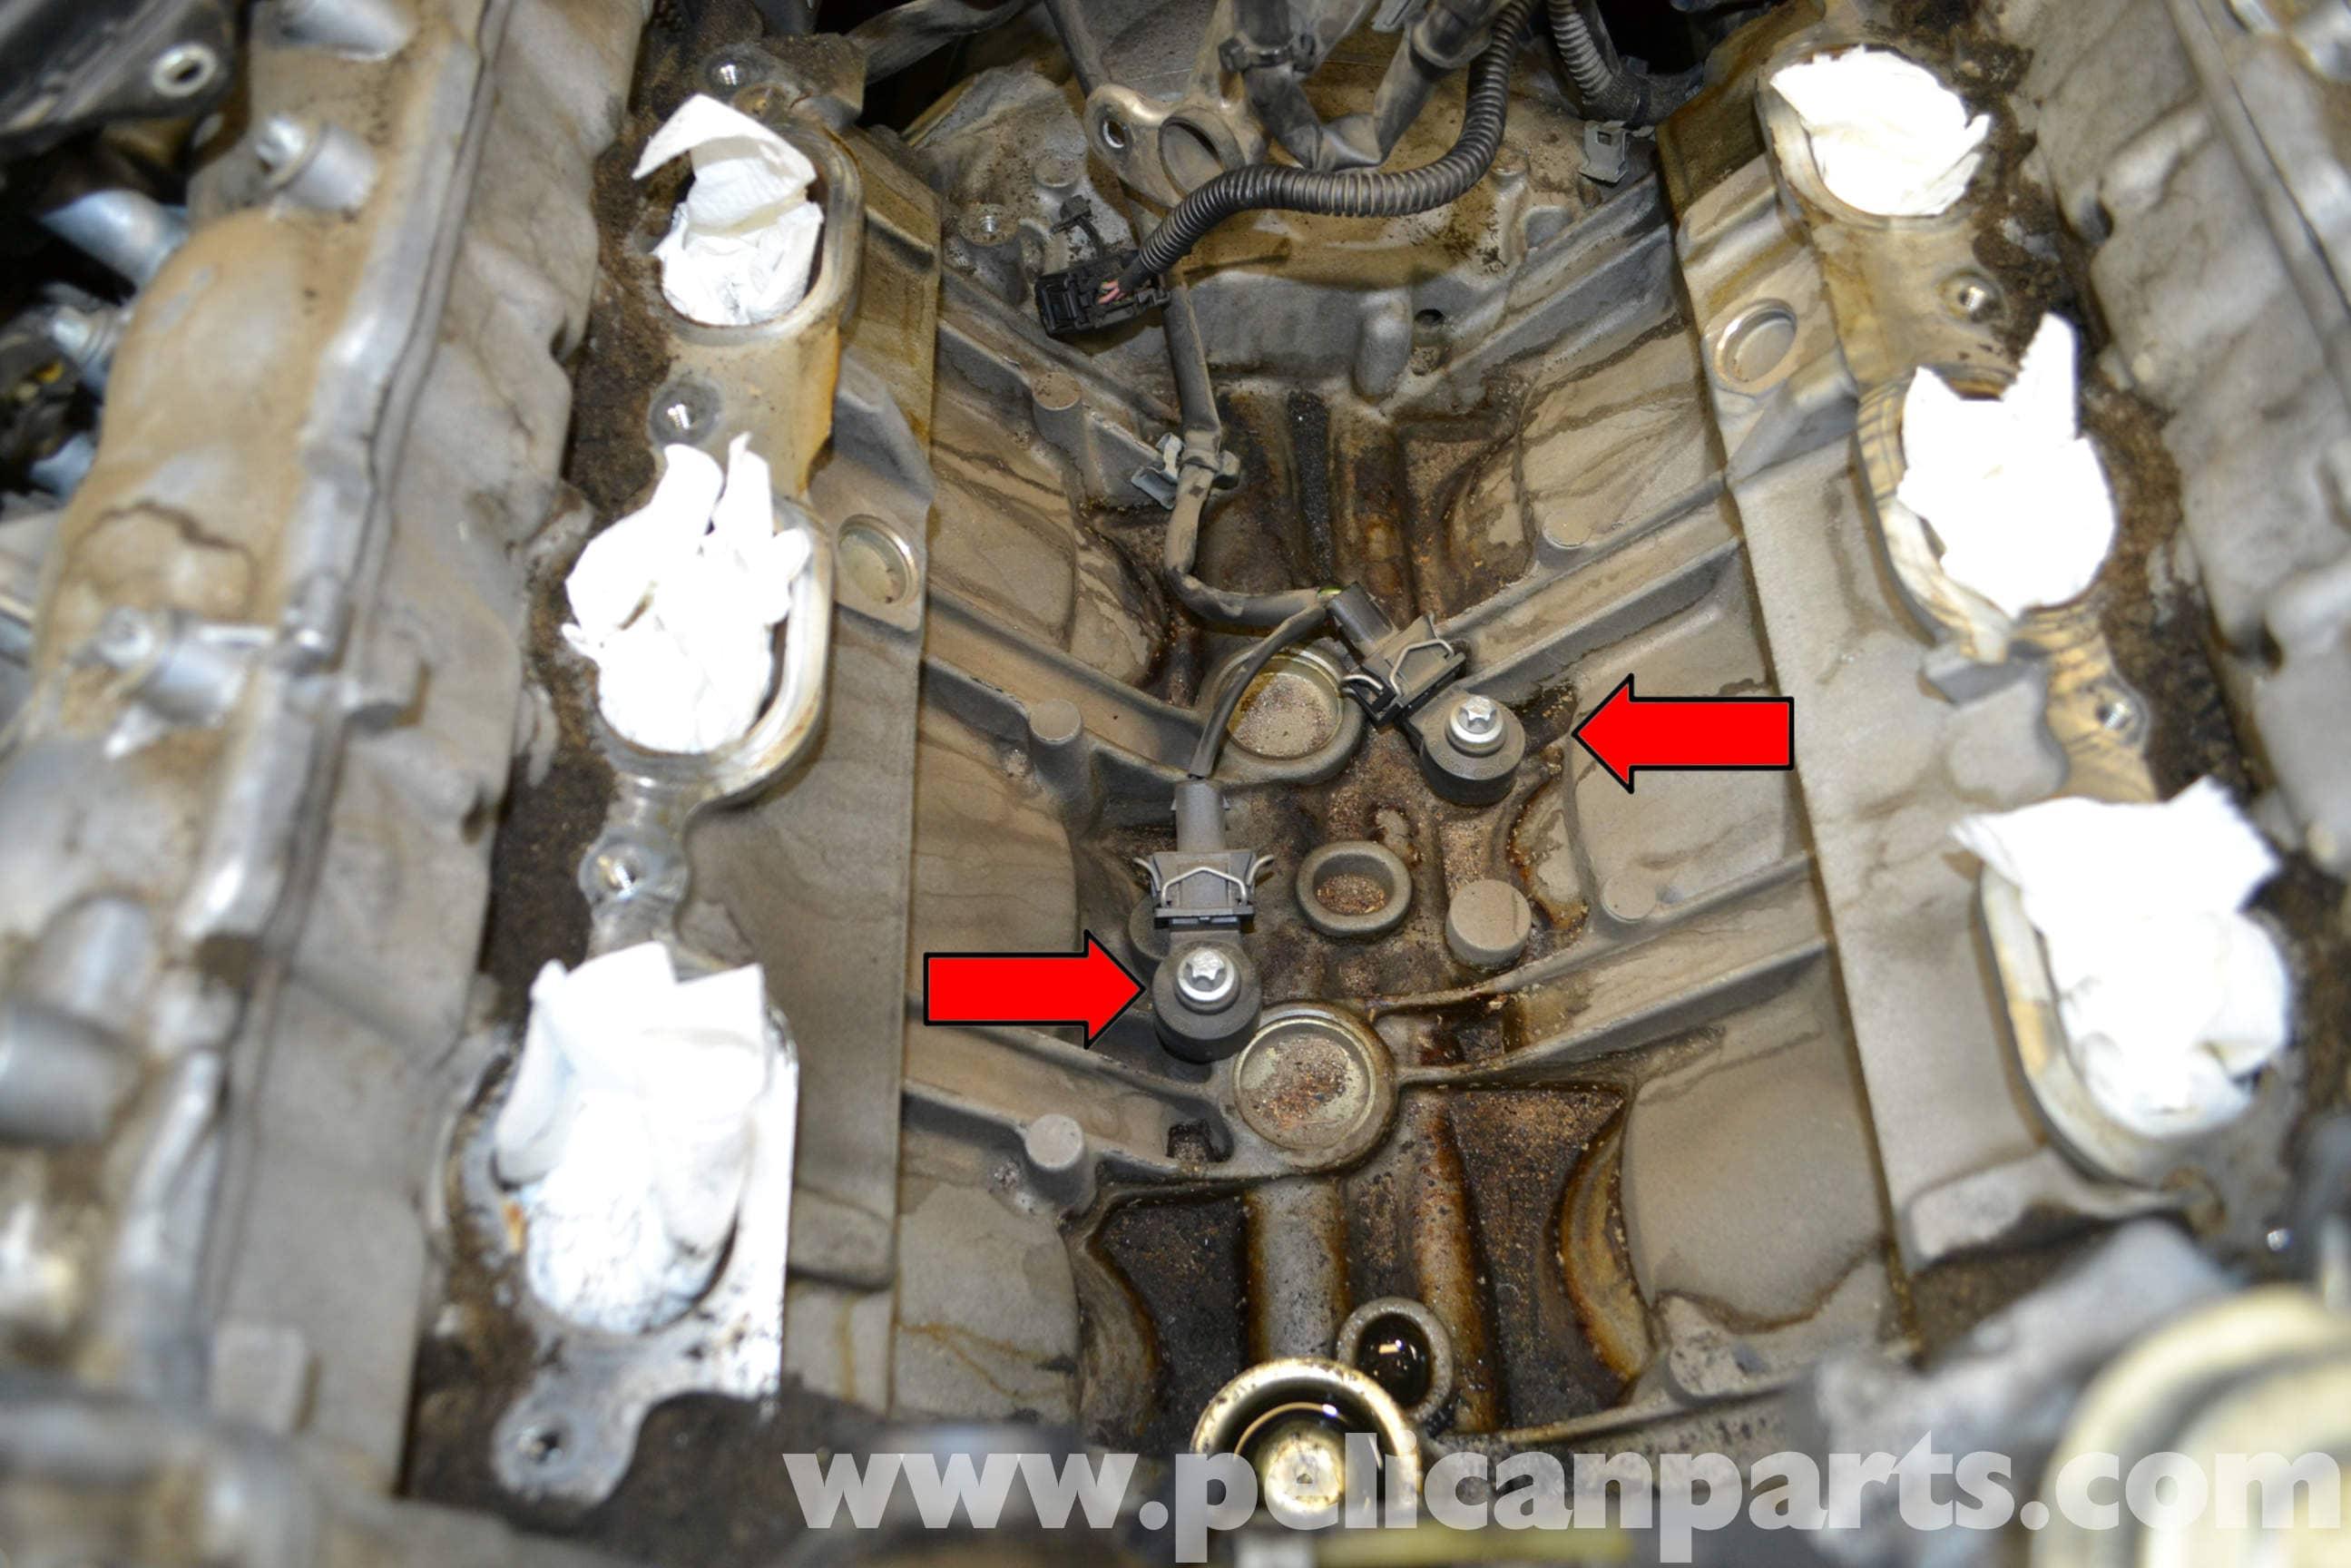 Mercedes-Benz W204 Knock Sensors Replacement - (2008-2014